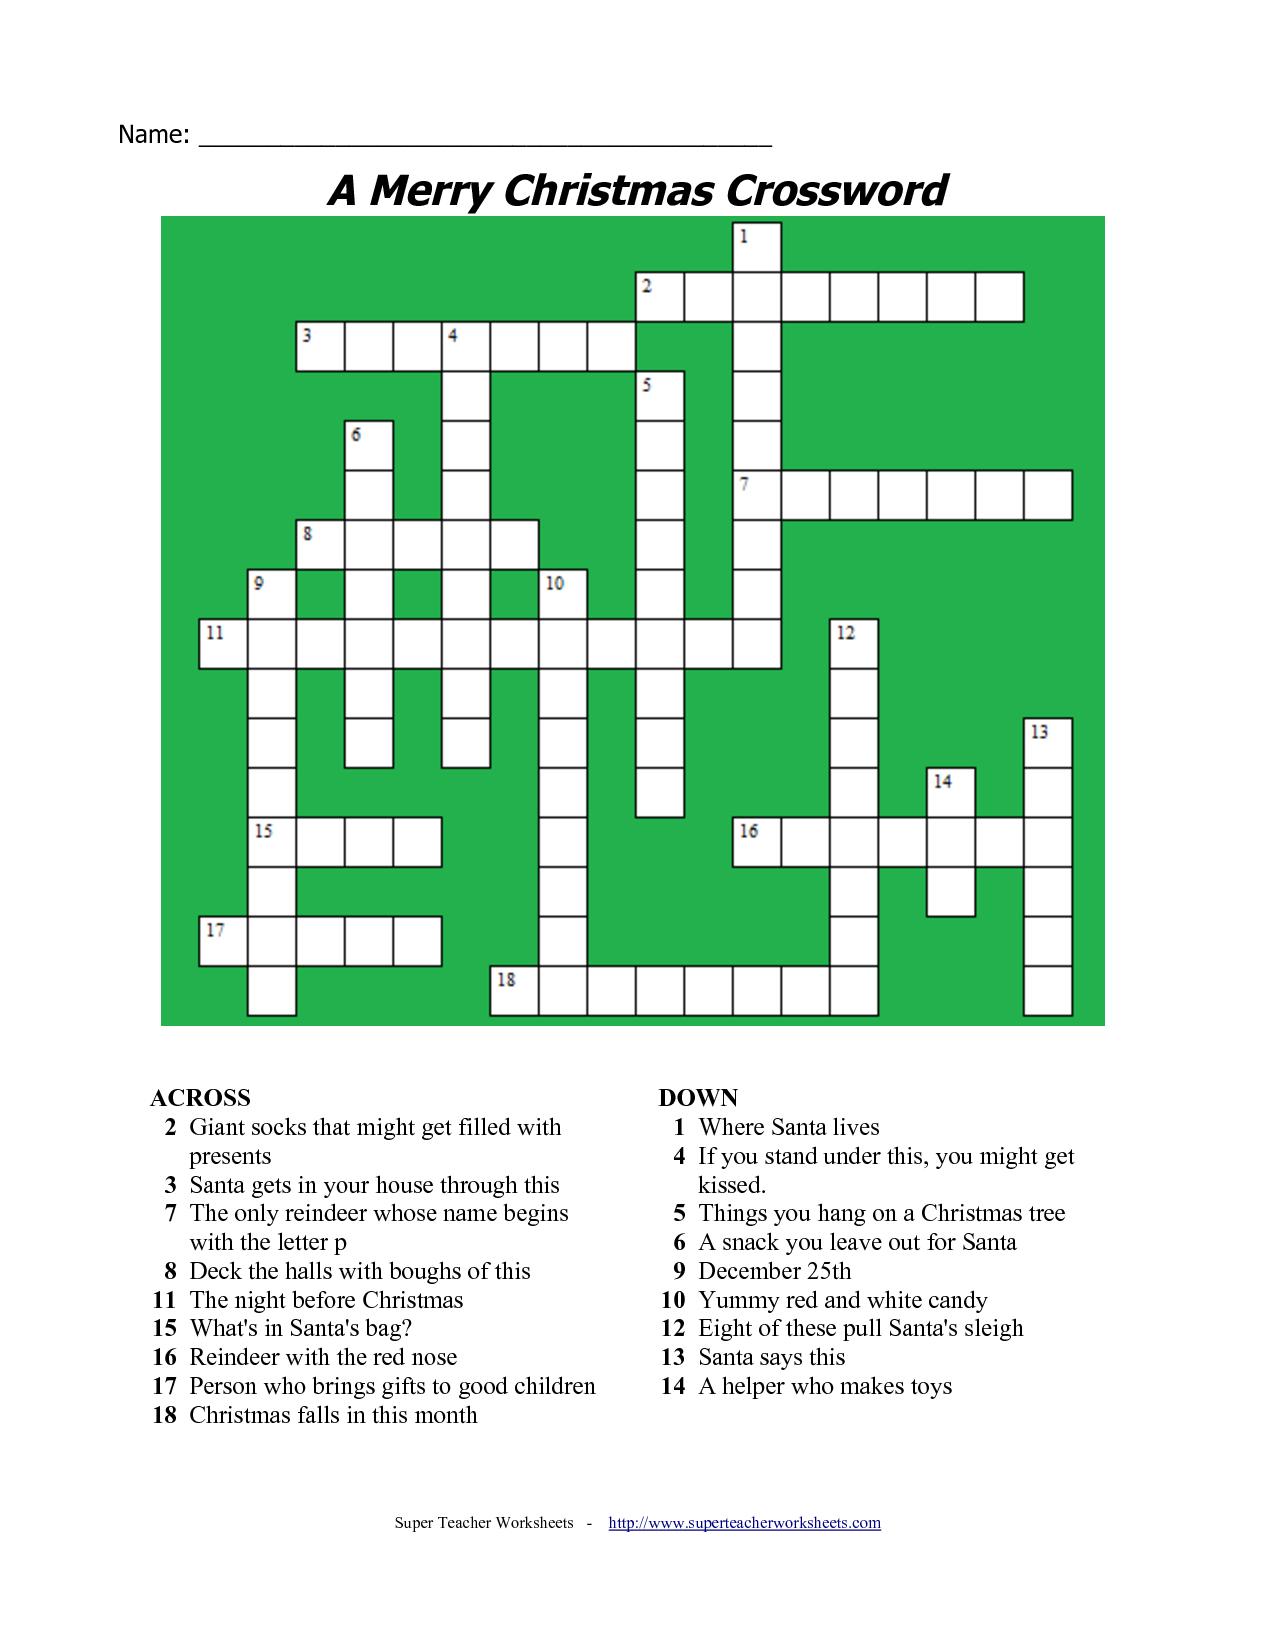 20 Fun Printable Christmas Crossword Puzzles   Kittybabylove - Printable Crossword Christmas